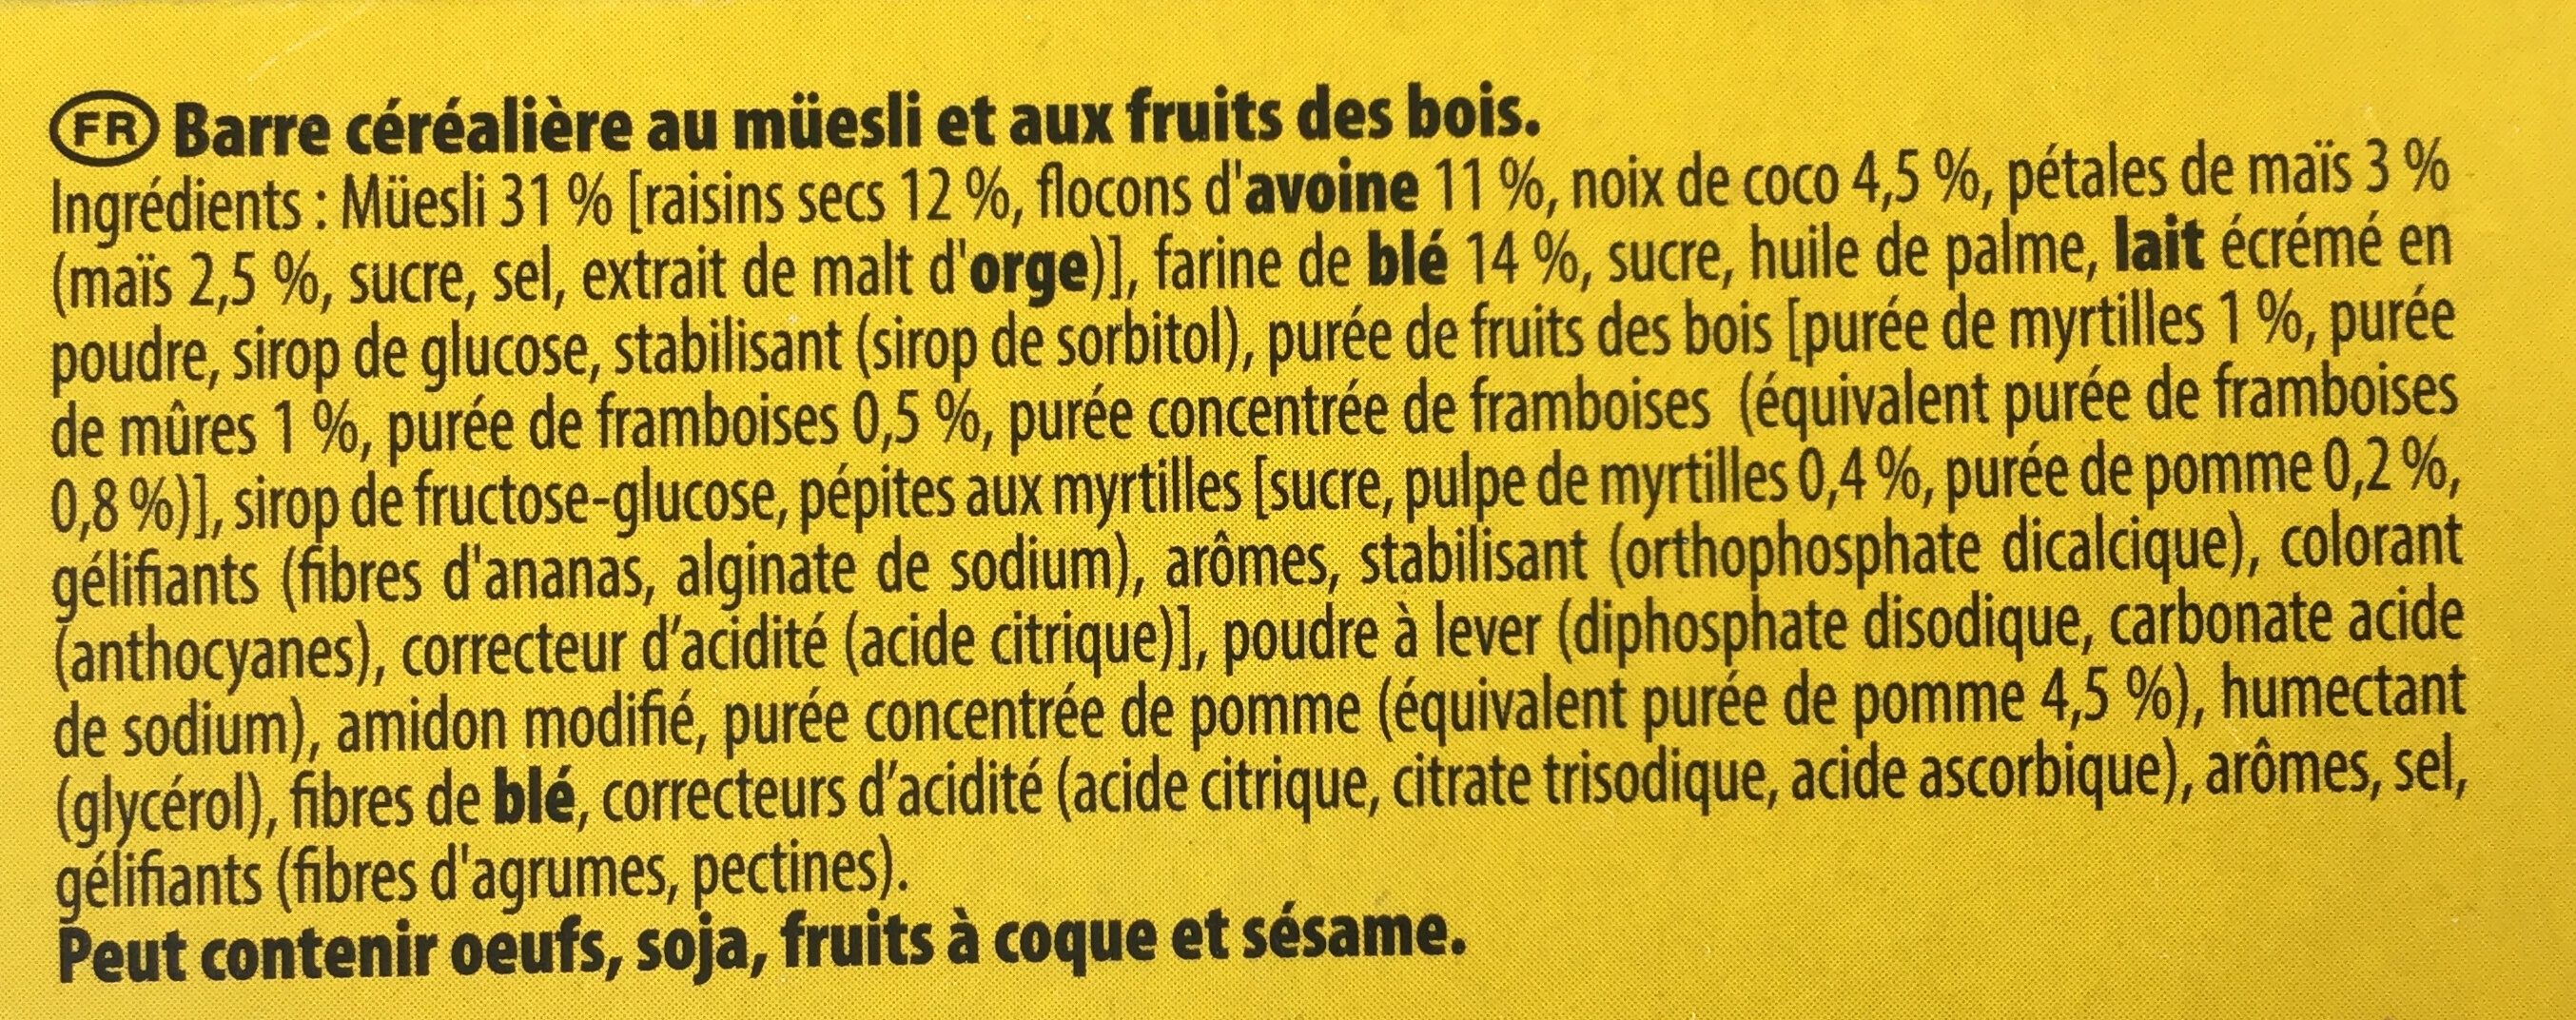 Grany, moelleux, fruit des bois, riche en fruits - Ingrediënten - fr